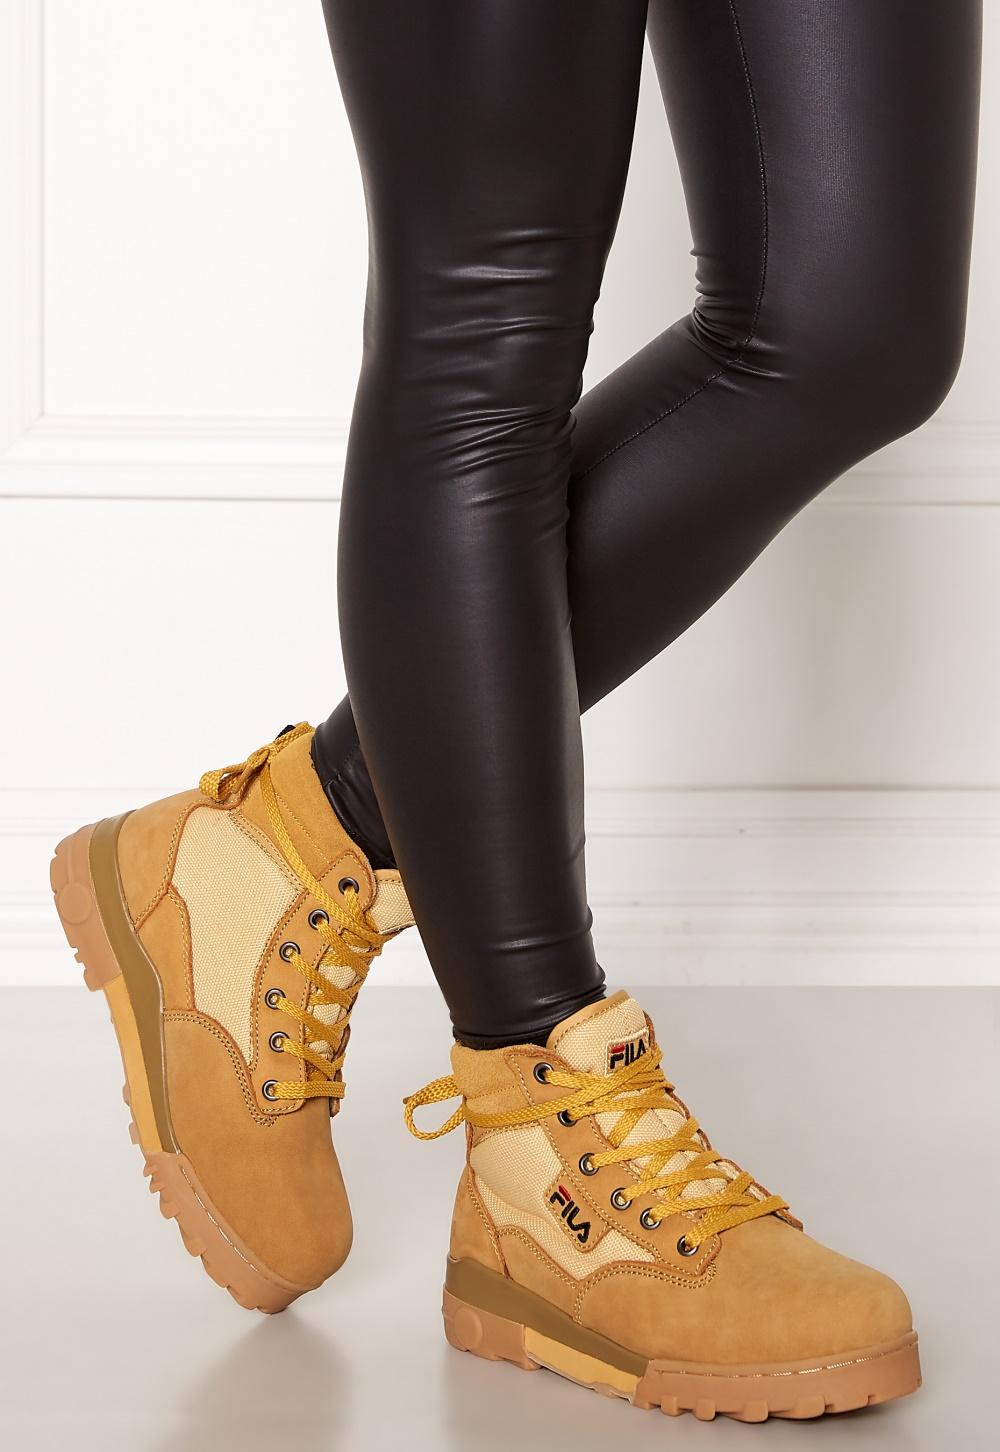 96e022b3390 FILA Grunge Mid Wmn Boots Chipmunk - Bubbleroom